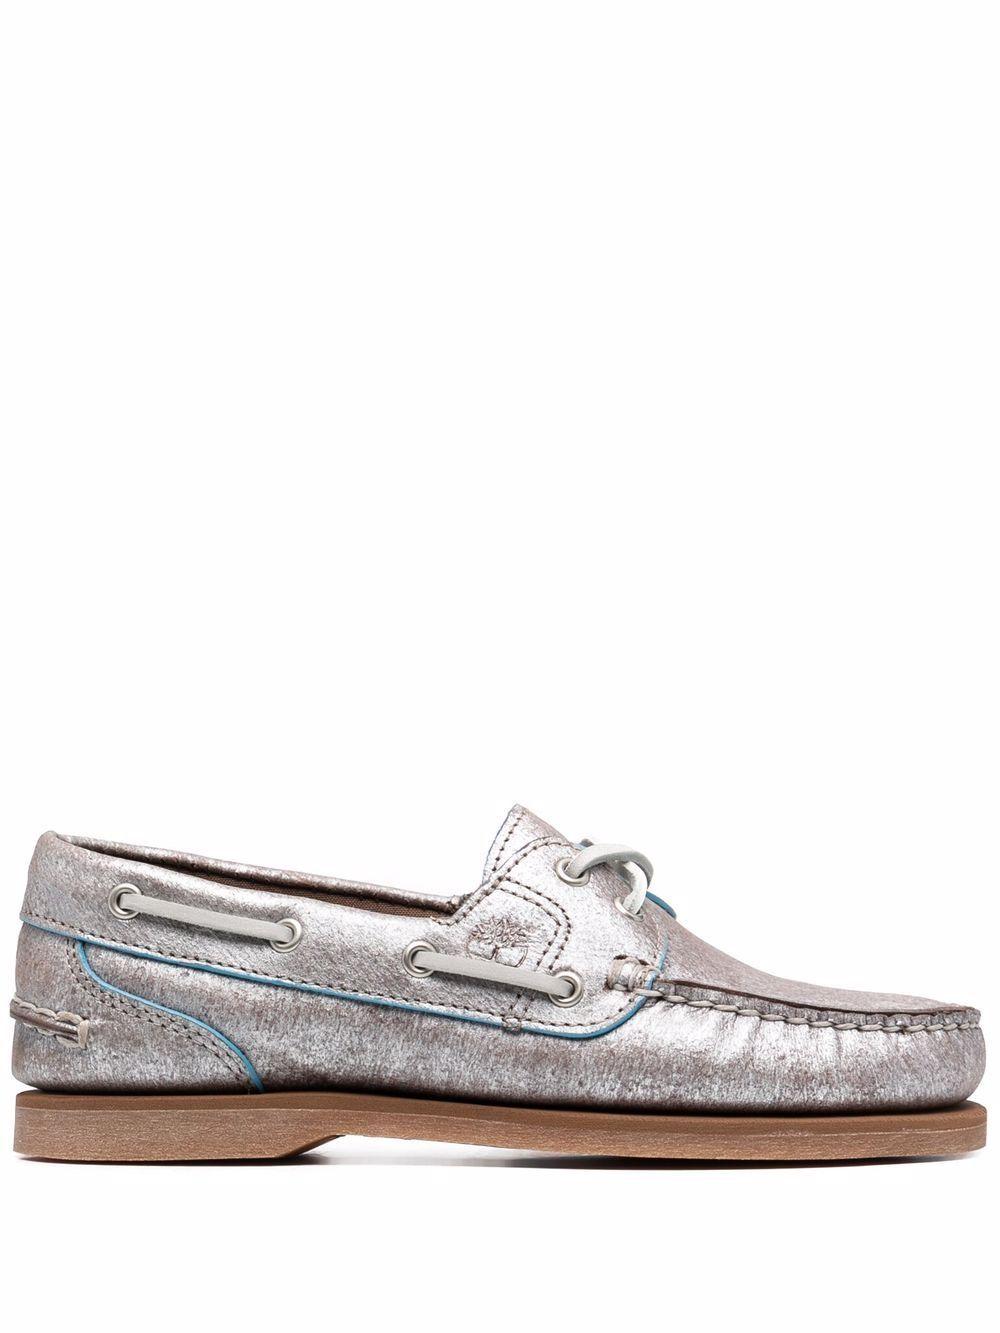 Timberland scarpe basse argento